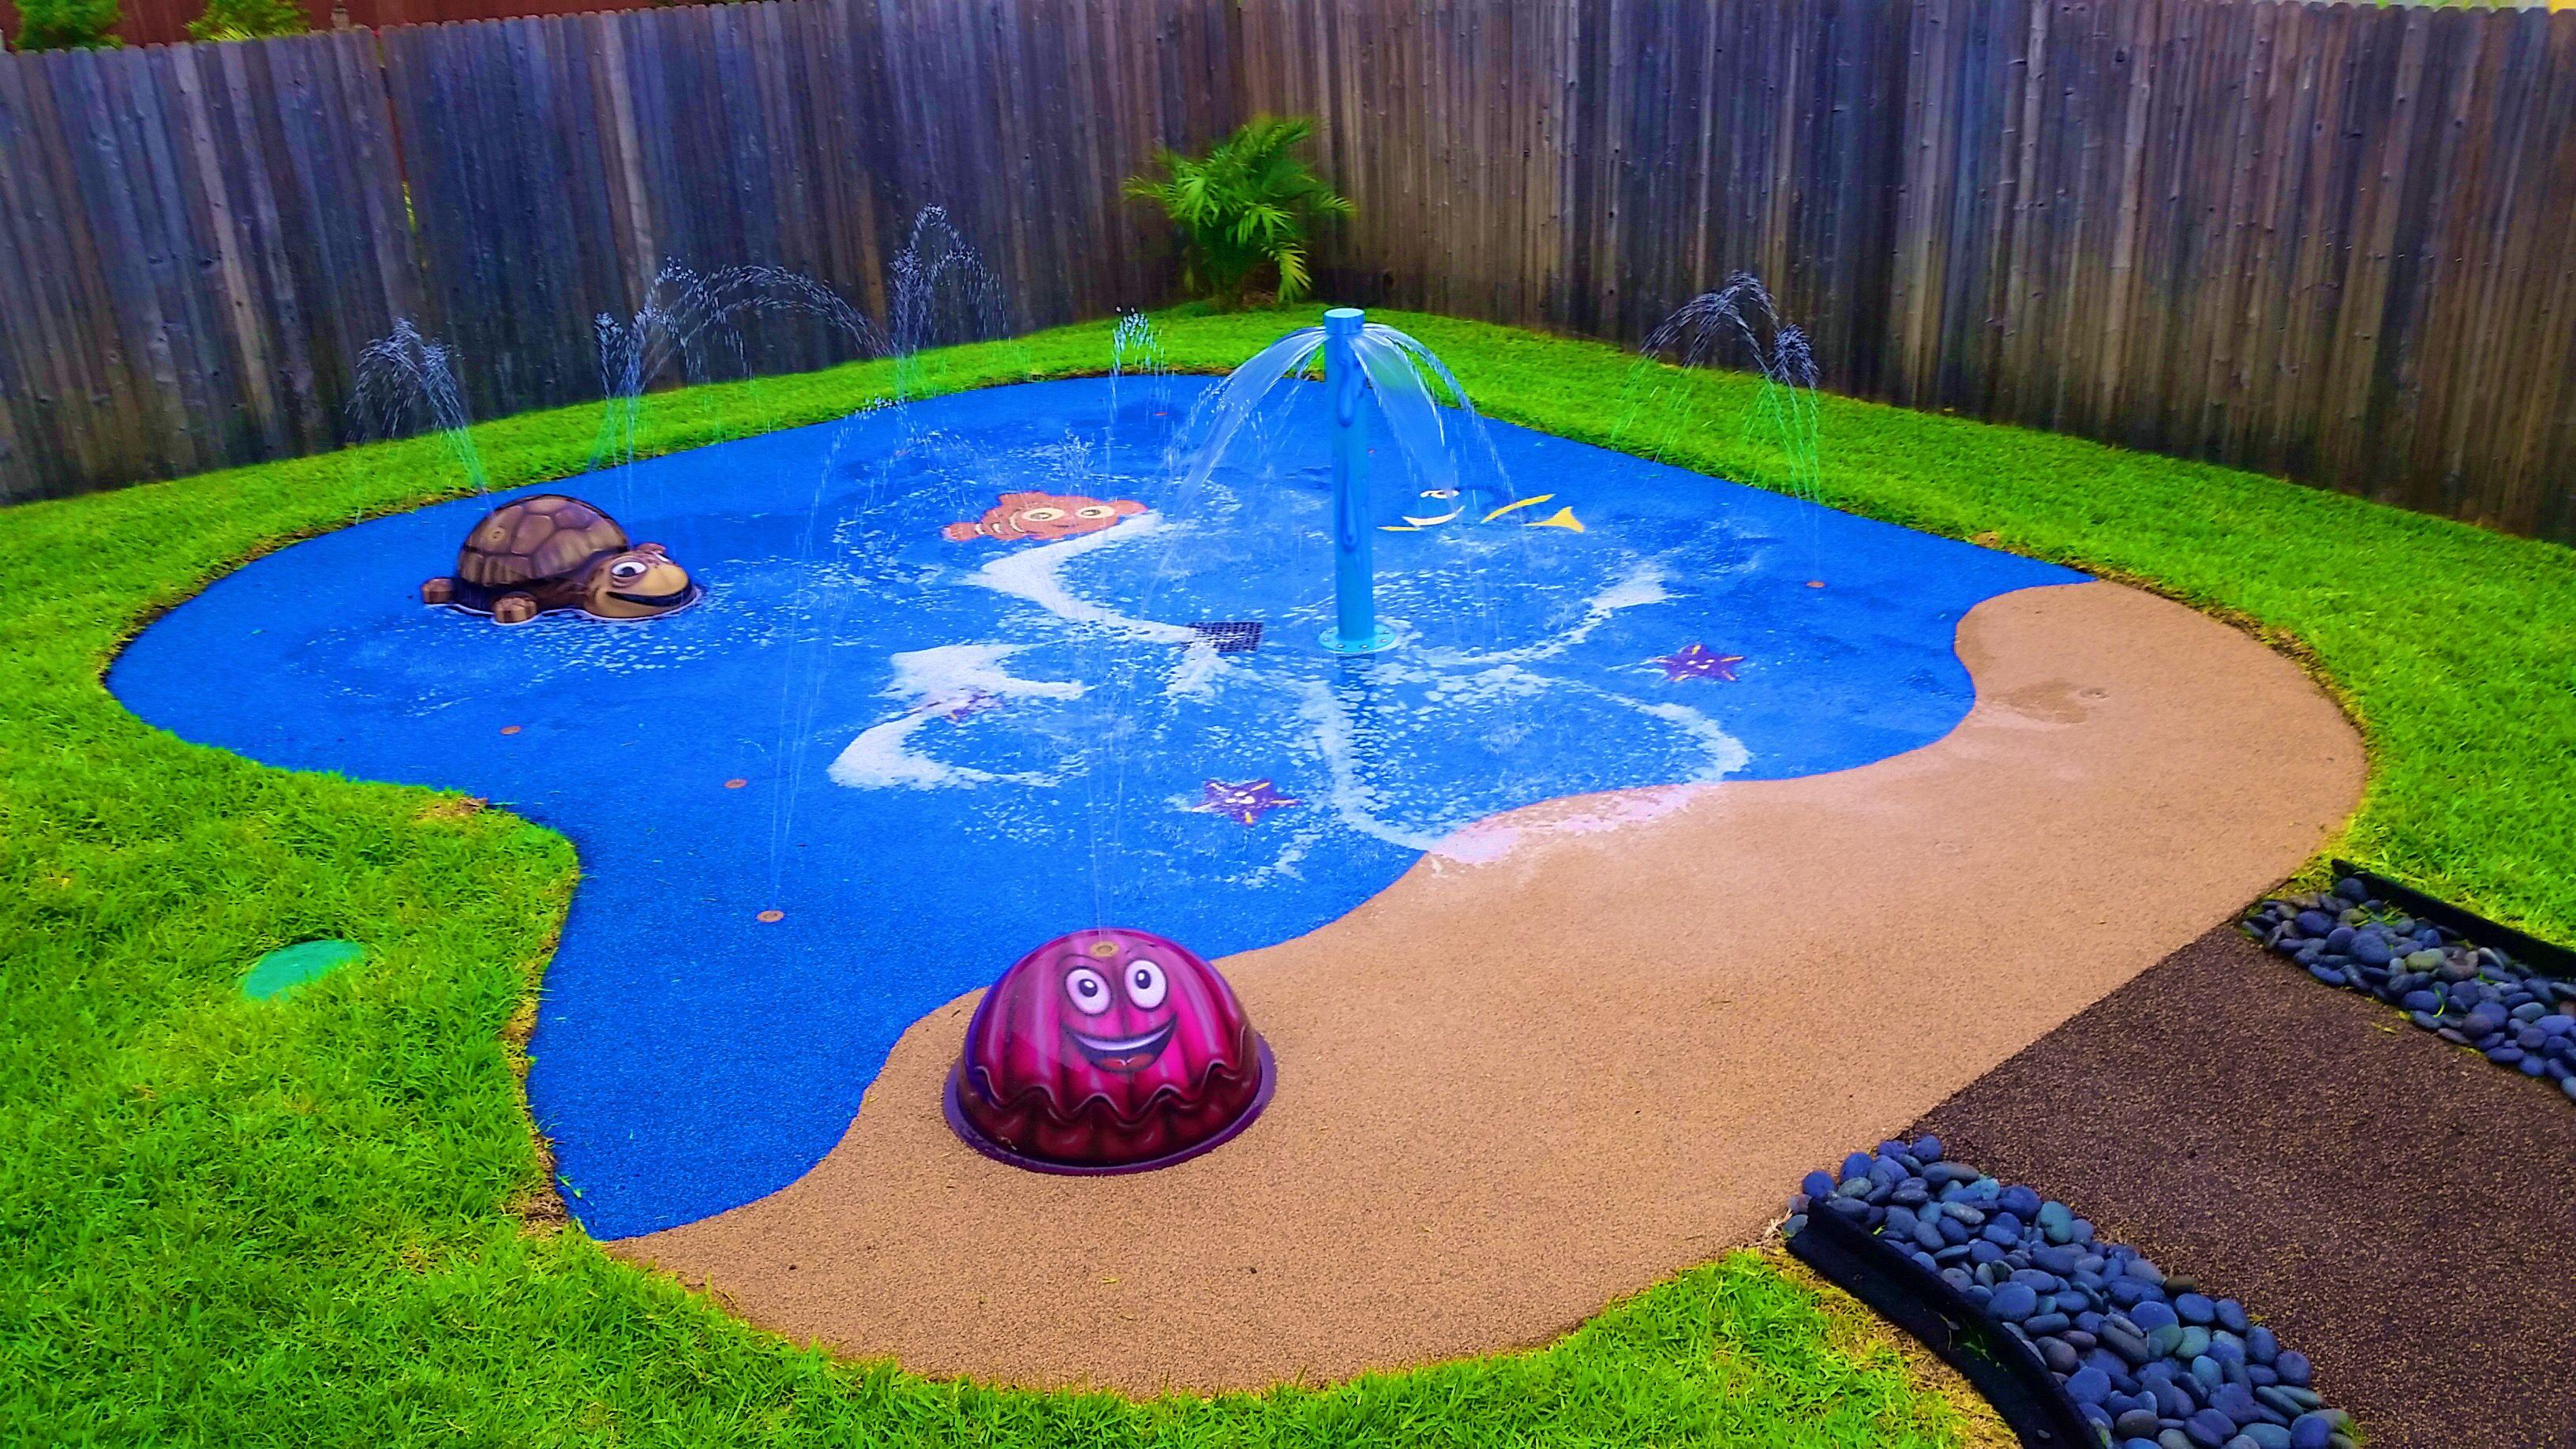 Residential Splash Pads By My Splash Pad Backyard Water Parks Backyard Water Feature Backyard Playground Backyard diy splash pad